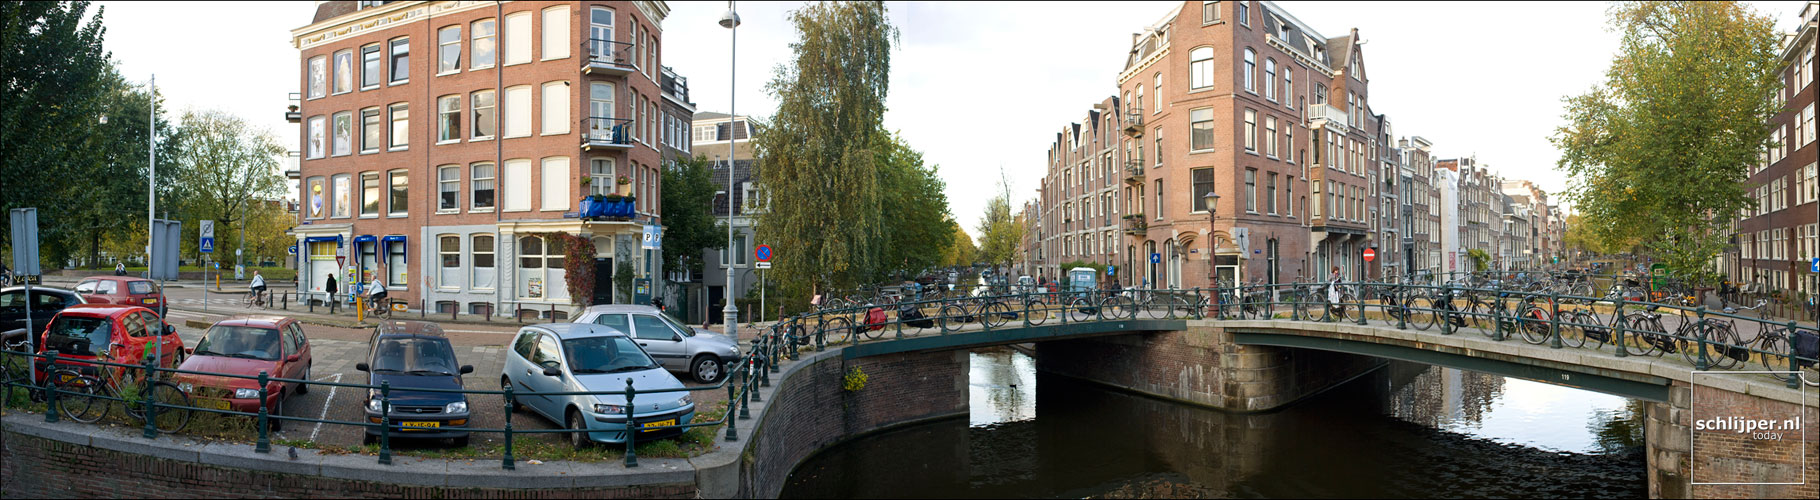 Nederland, Amsterdam, 17 oktober 2008